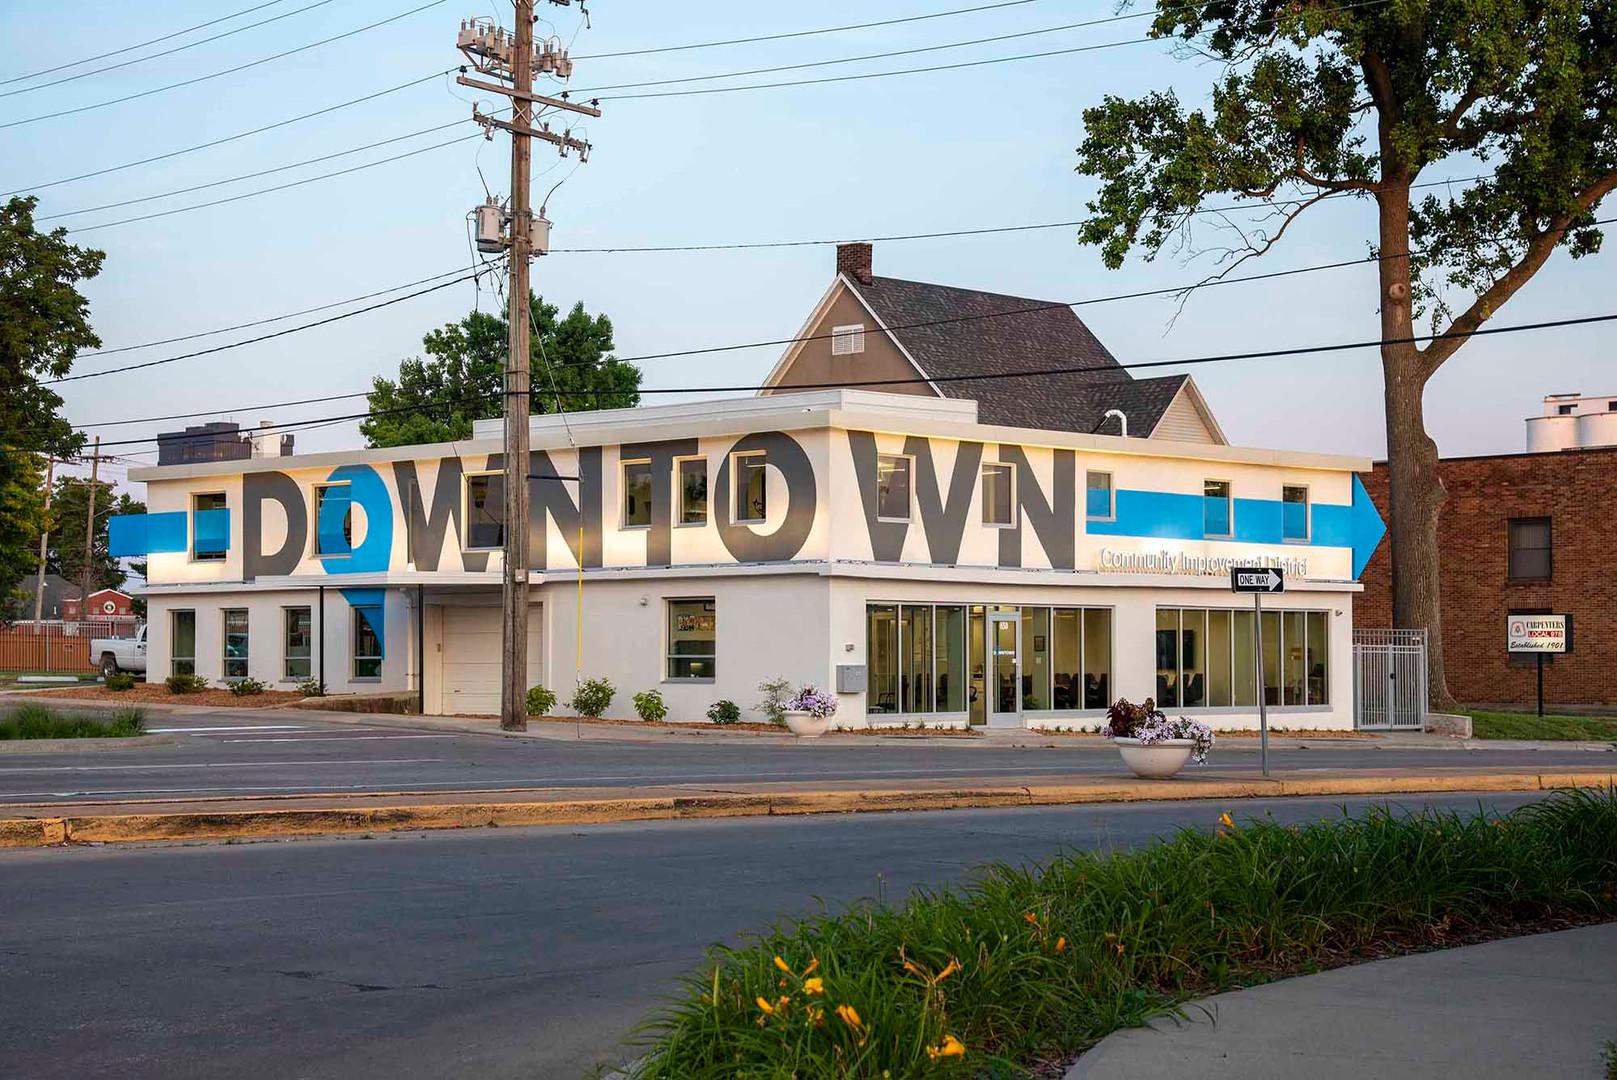 Downtown Springfield Community Improvement District